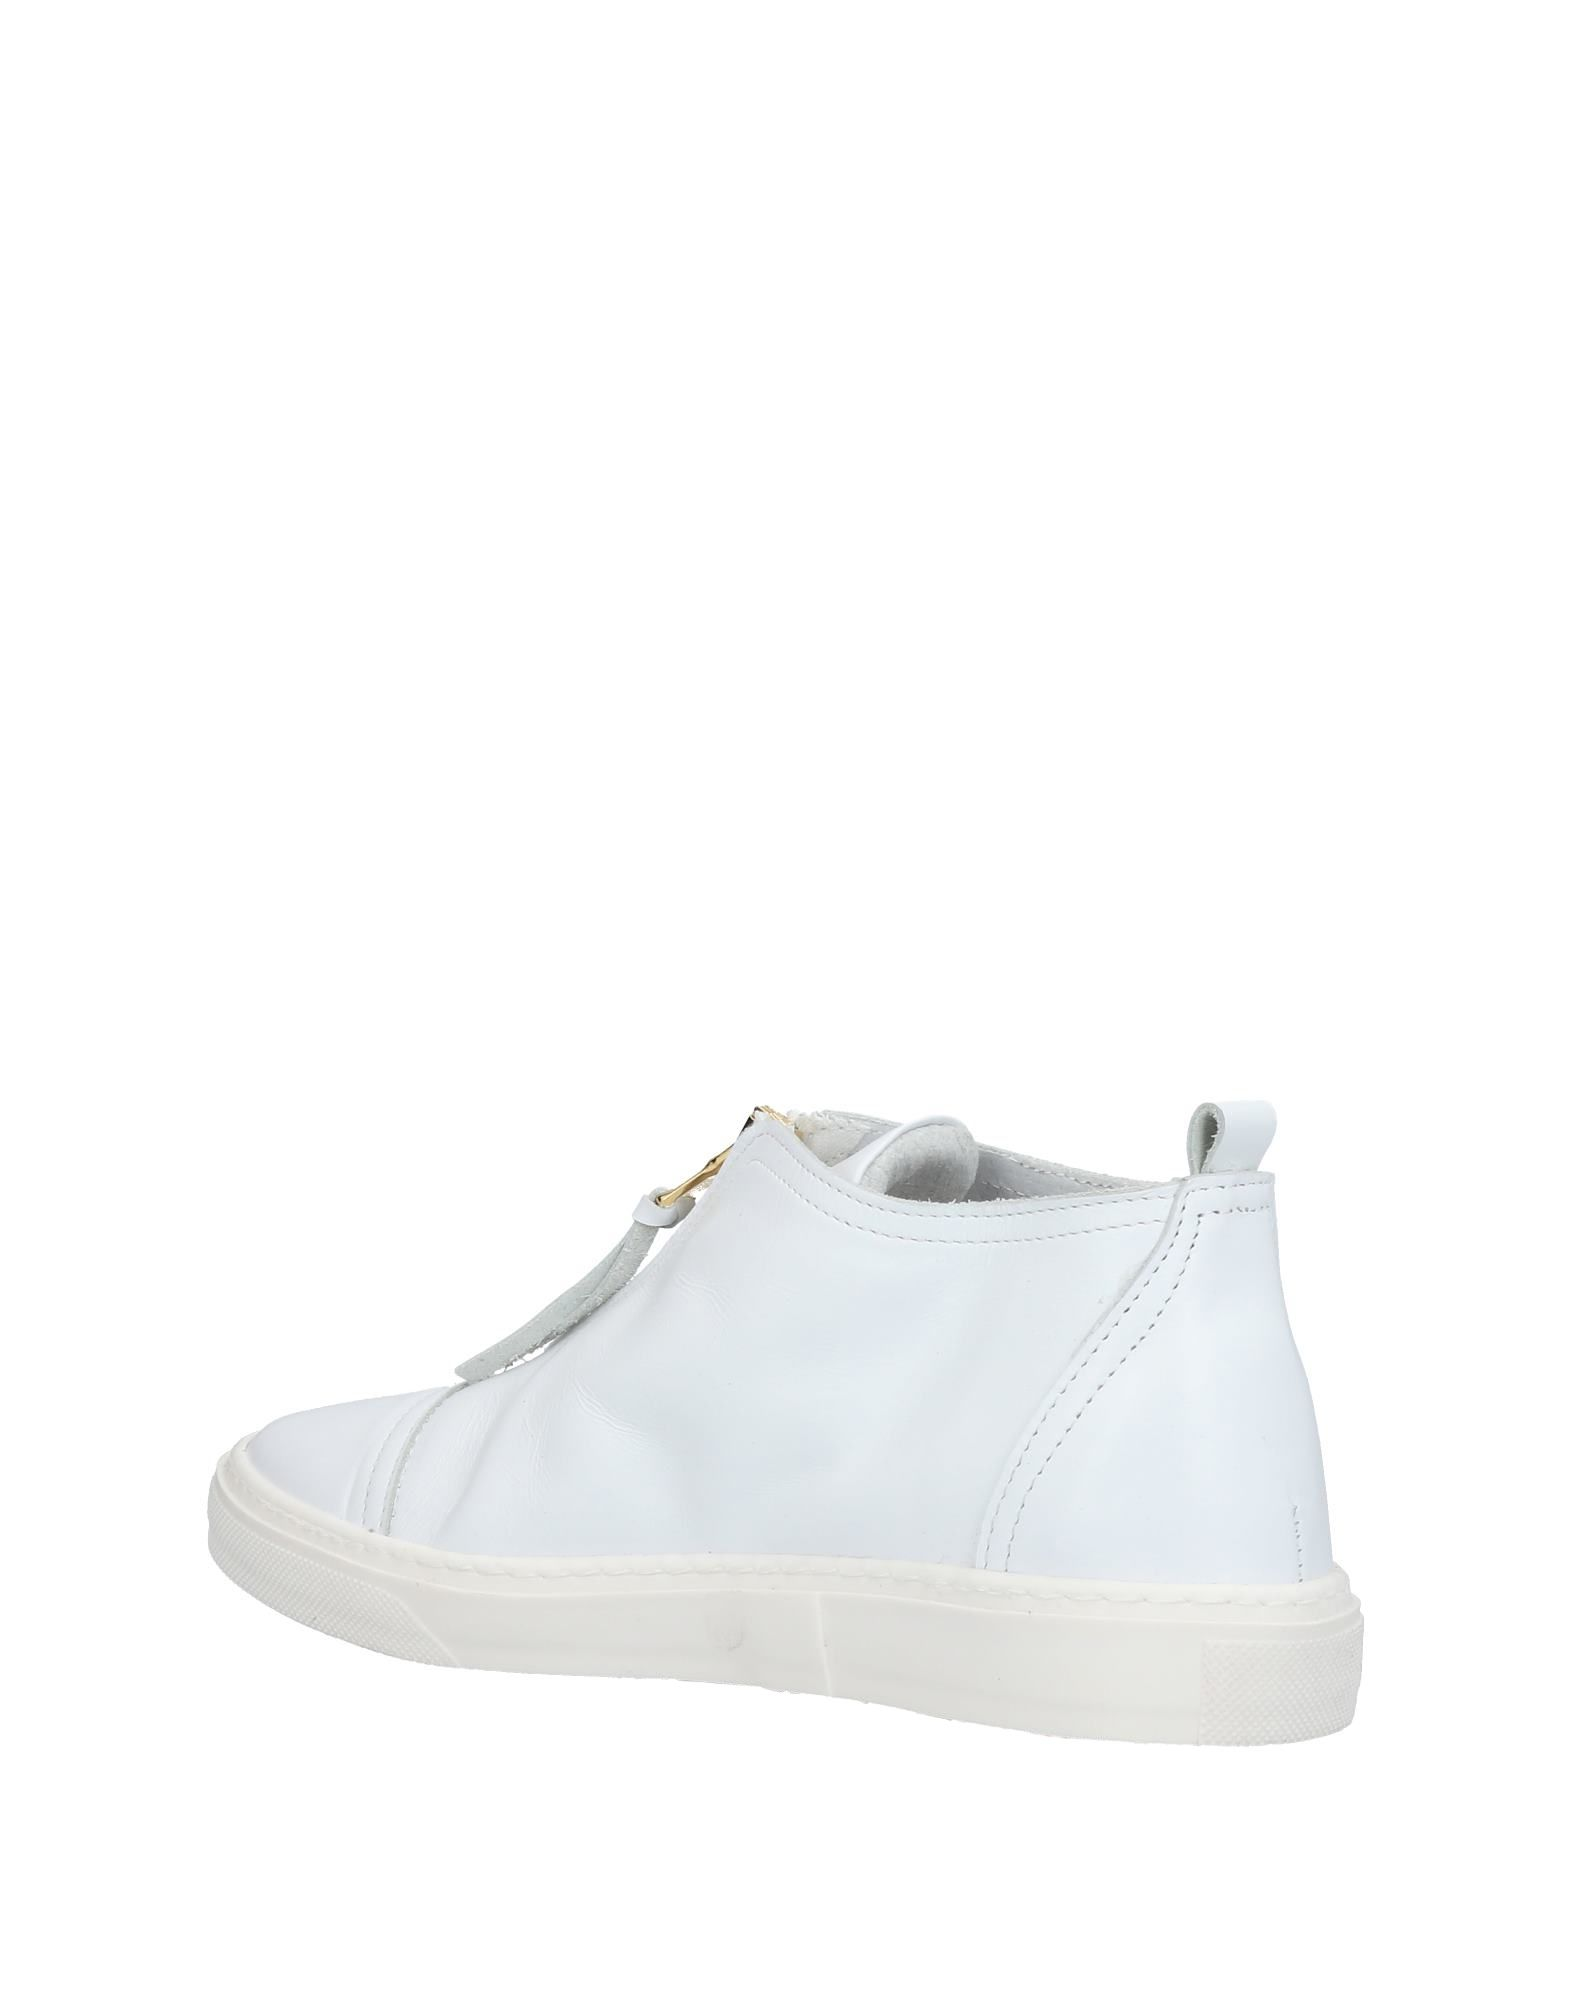 ... Sneakers Nila & Nila Femme - Sneakers Nila & Nila sur ...